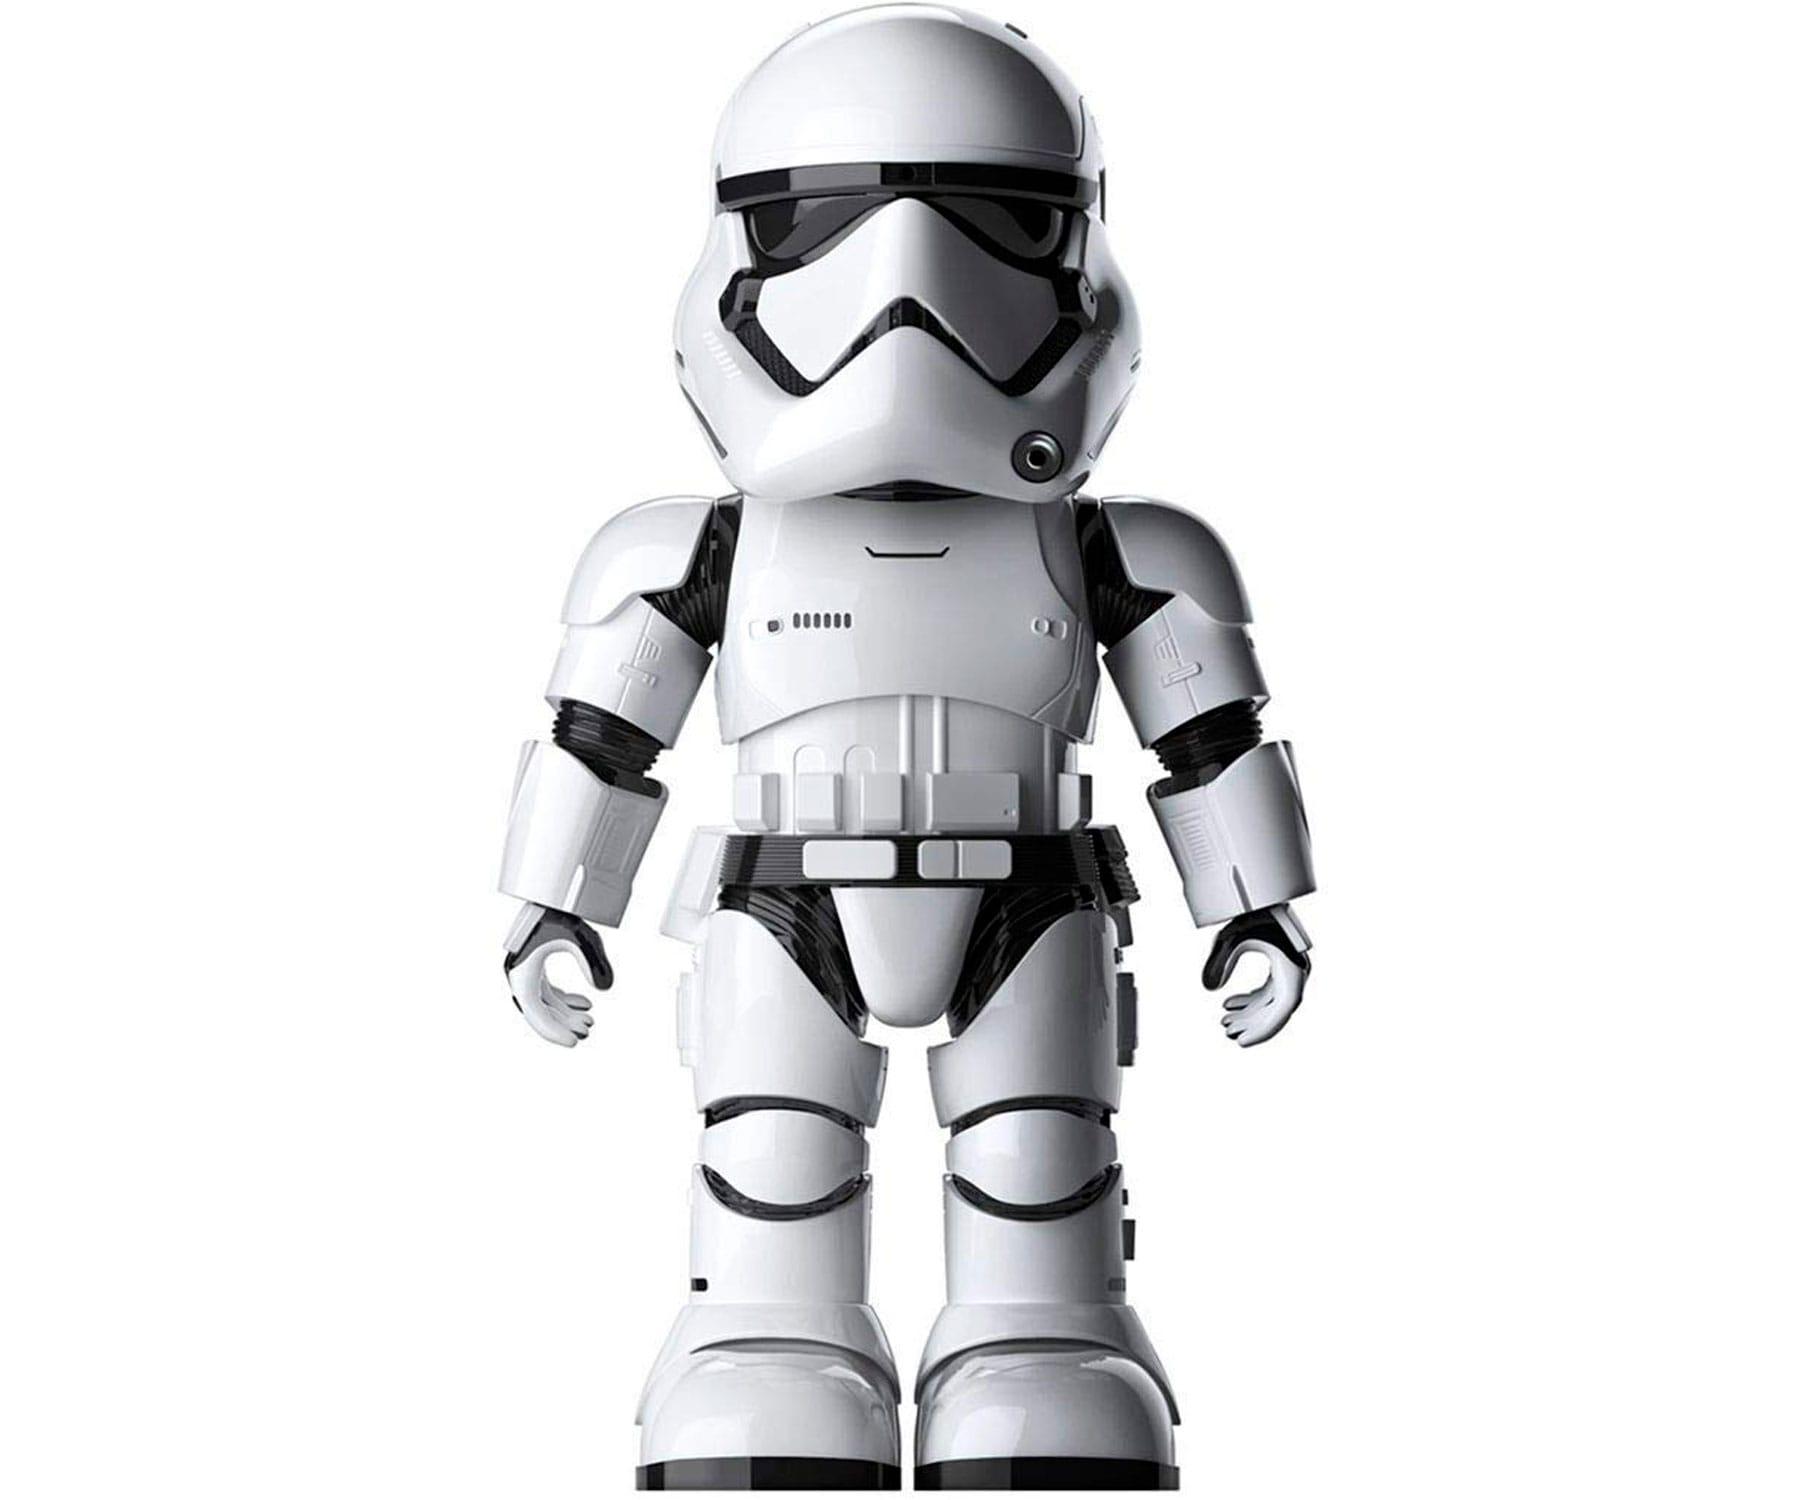 UBTECH STAR WARS STORMTROOPER ROBOT INTERACTIVO CON COMPANION APP